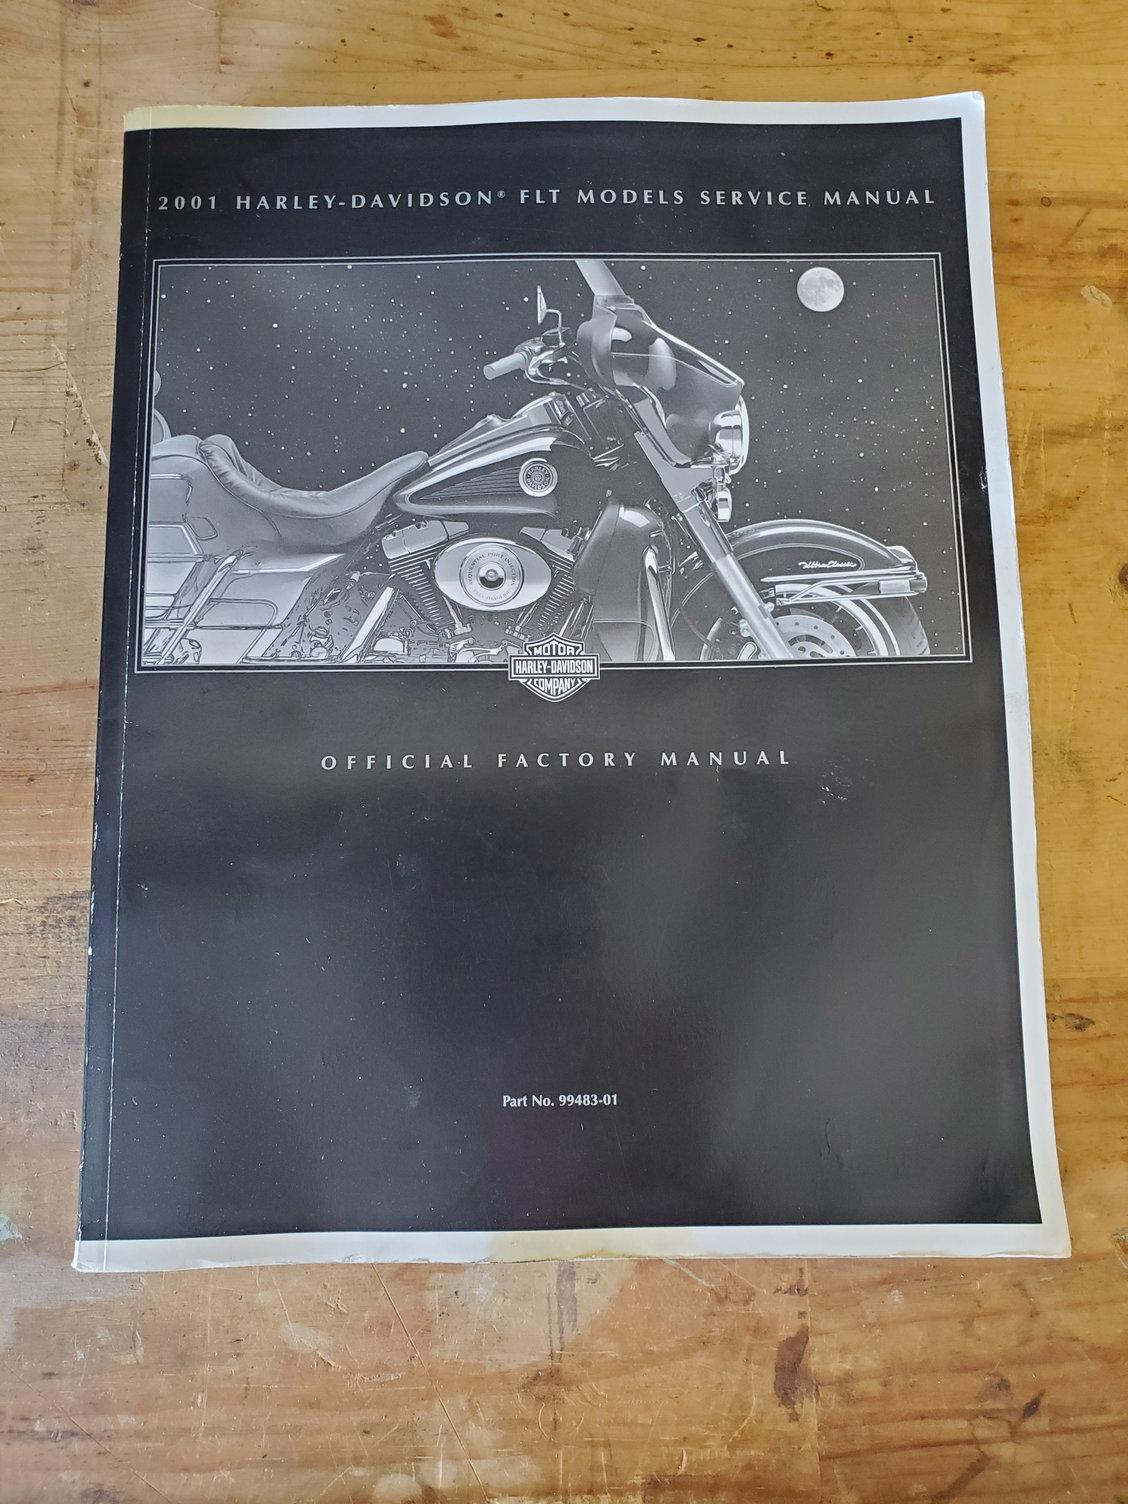 2001 FL Touring Harley Service Manual - Harley Davidson Forums